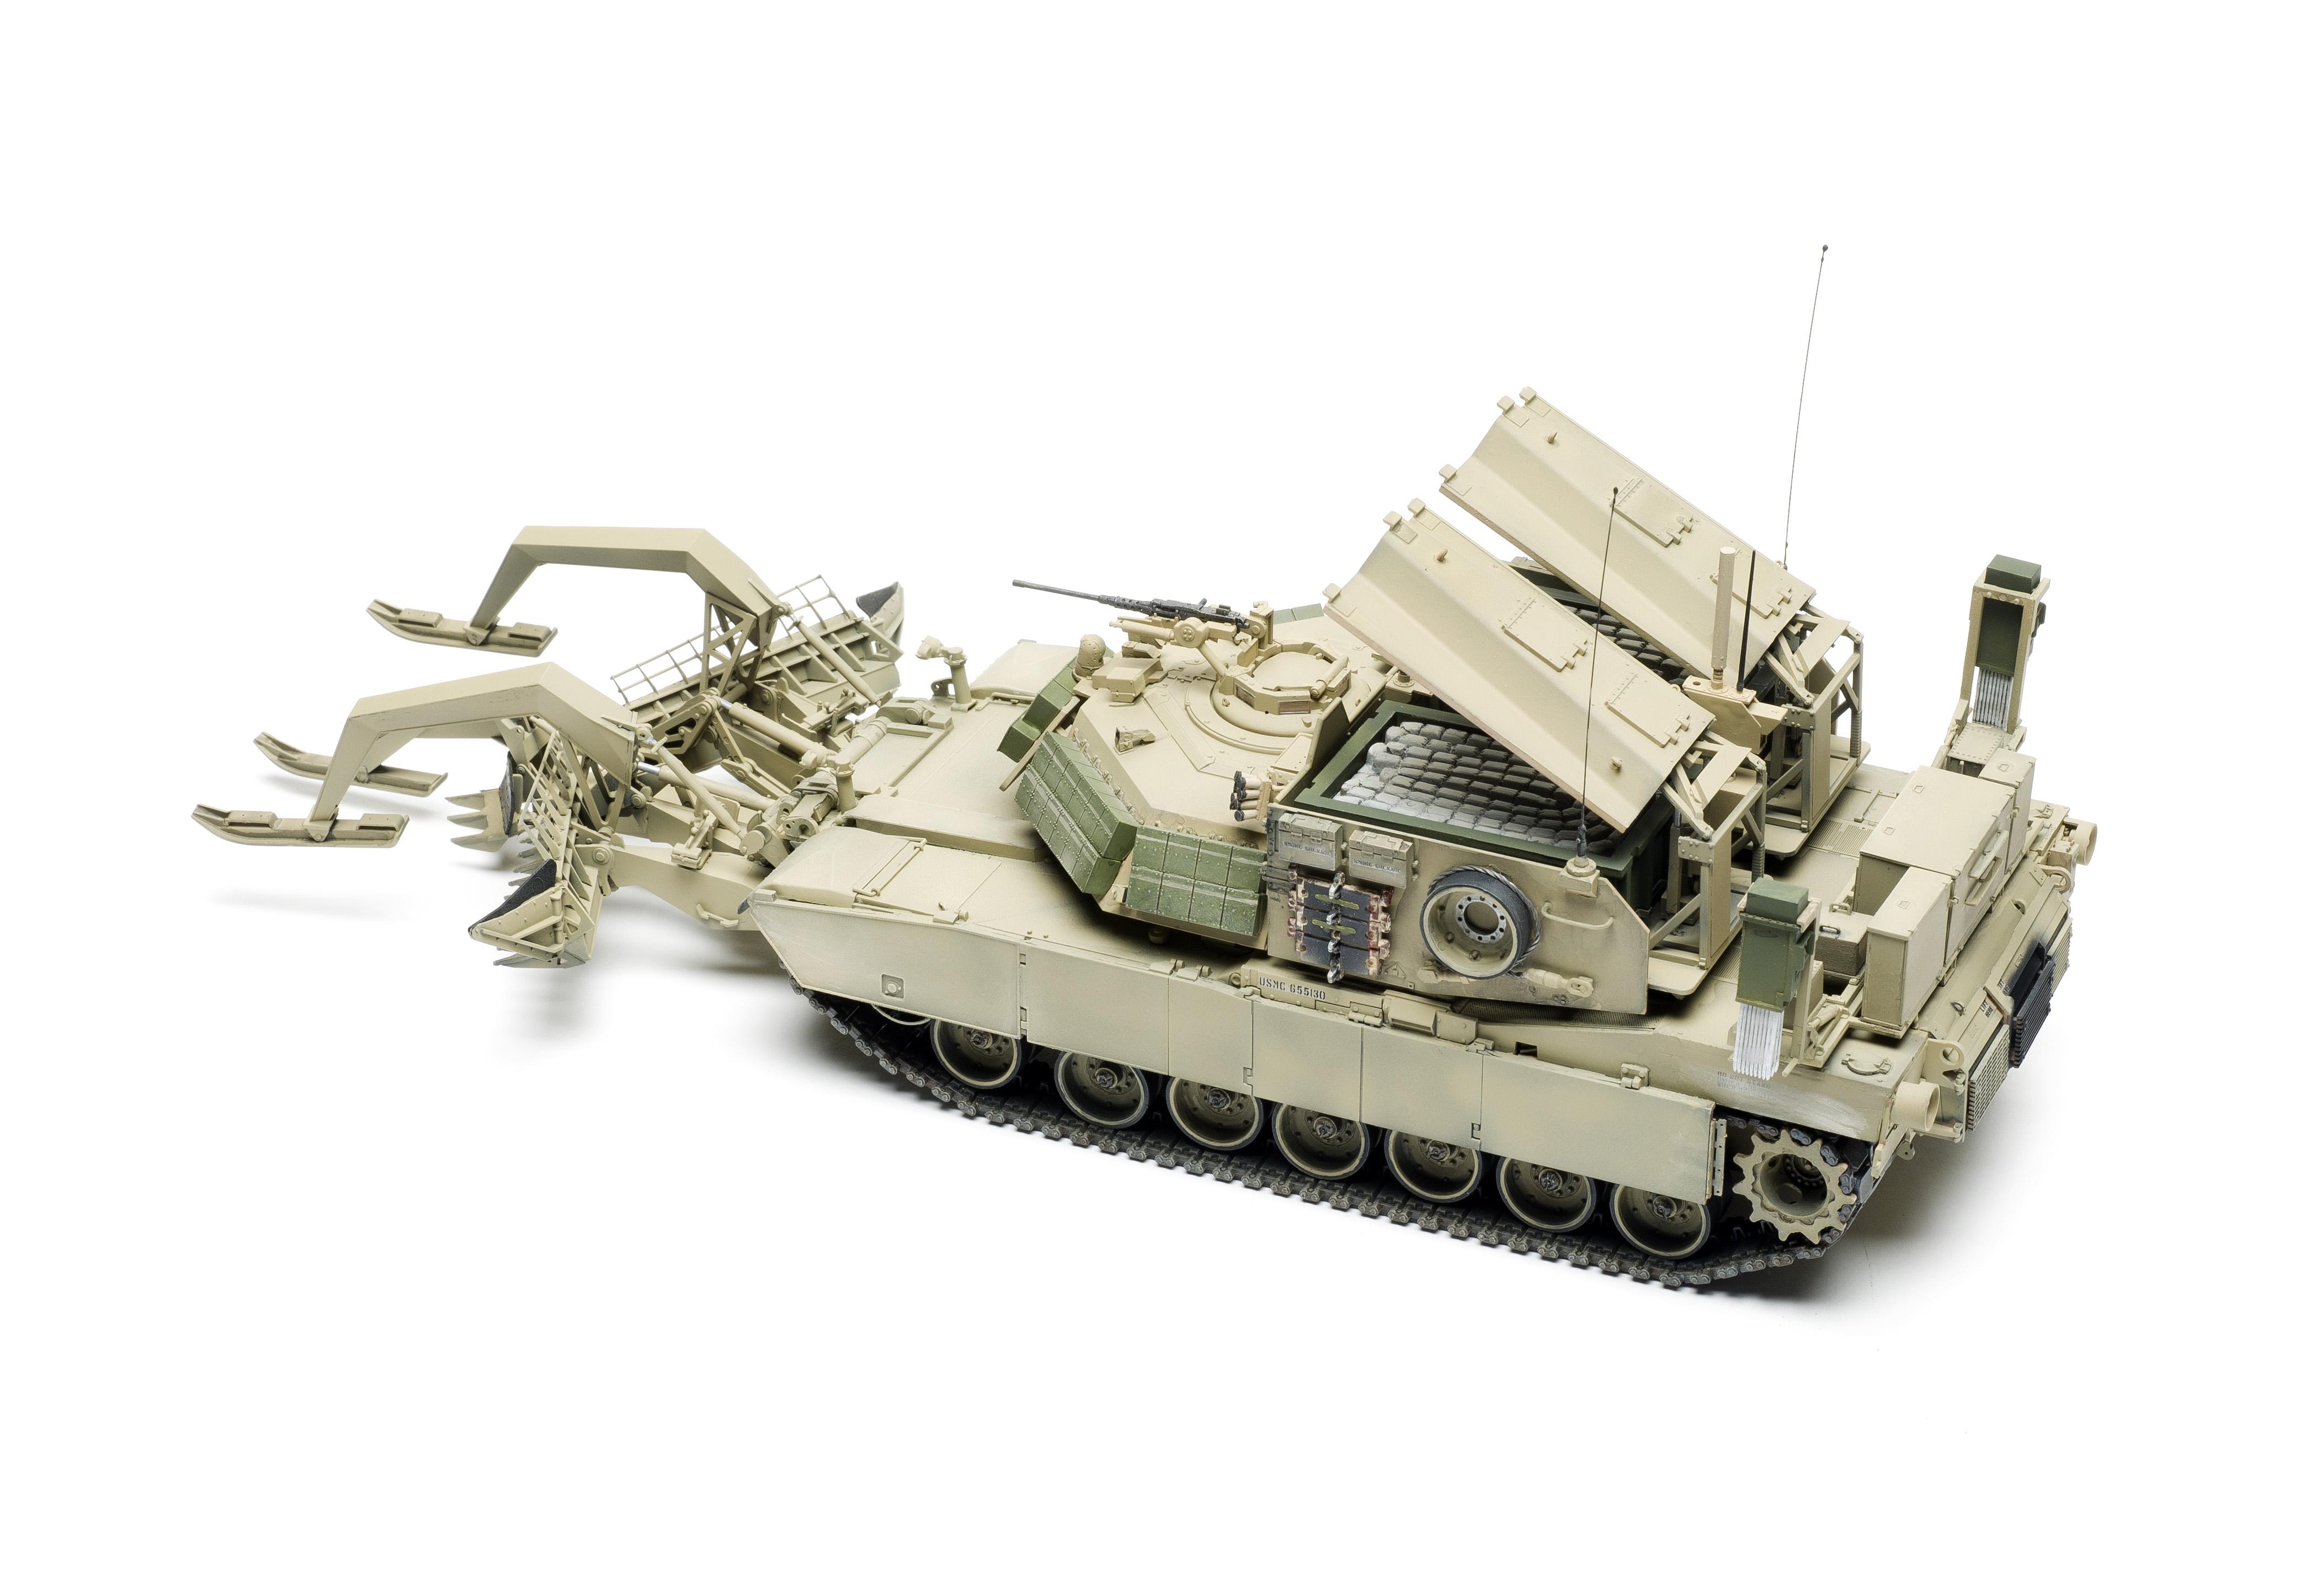 Rye Field Model RFM RM5011 1//35 M1 Assault Breacher Vehicle plastic kit